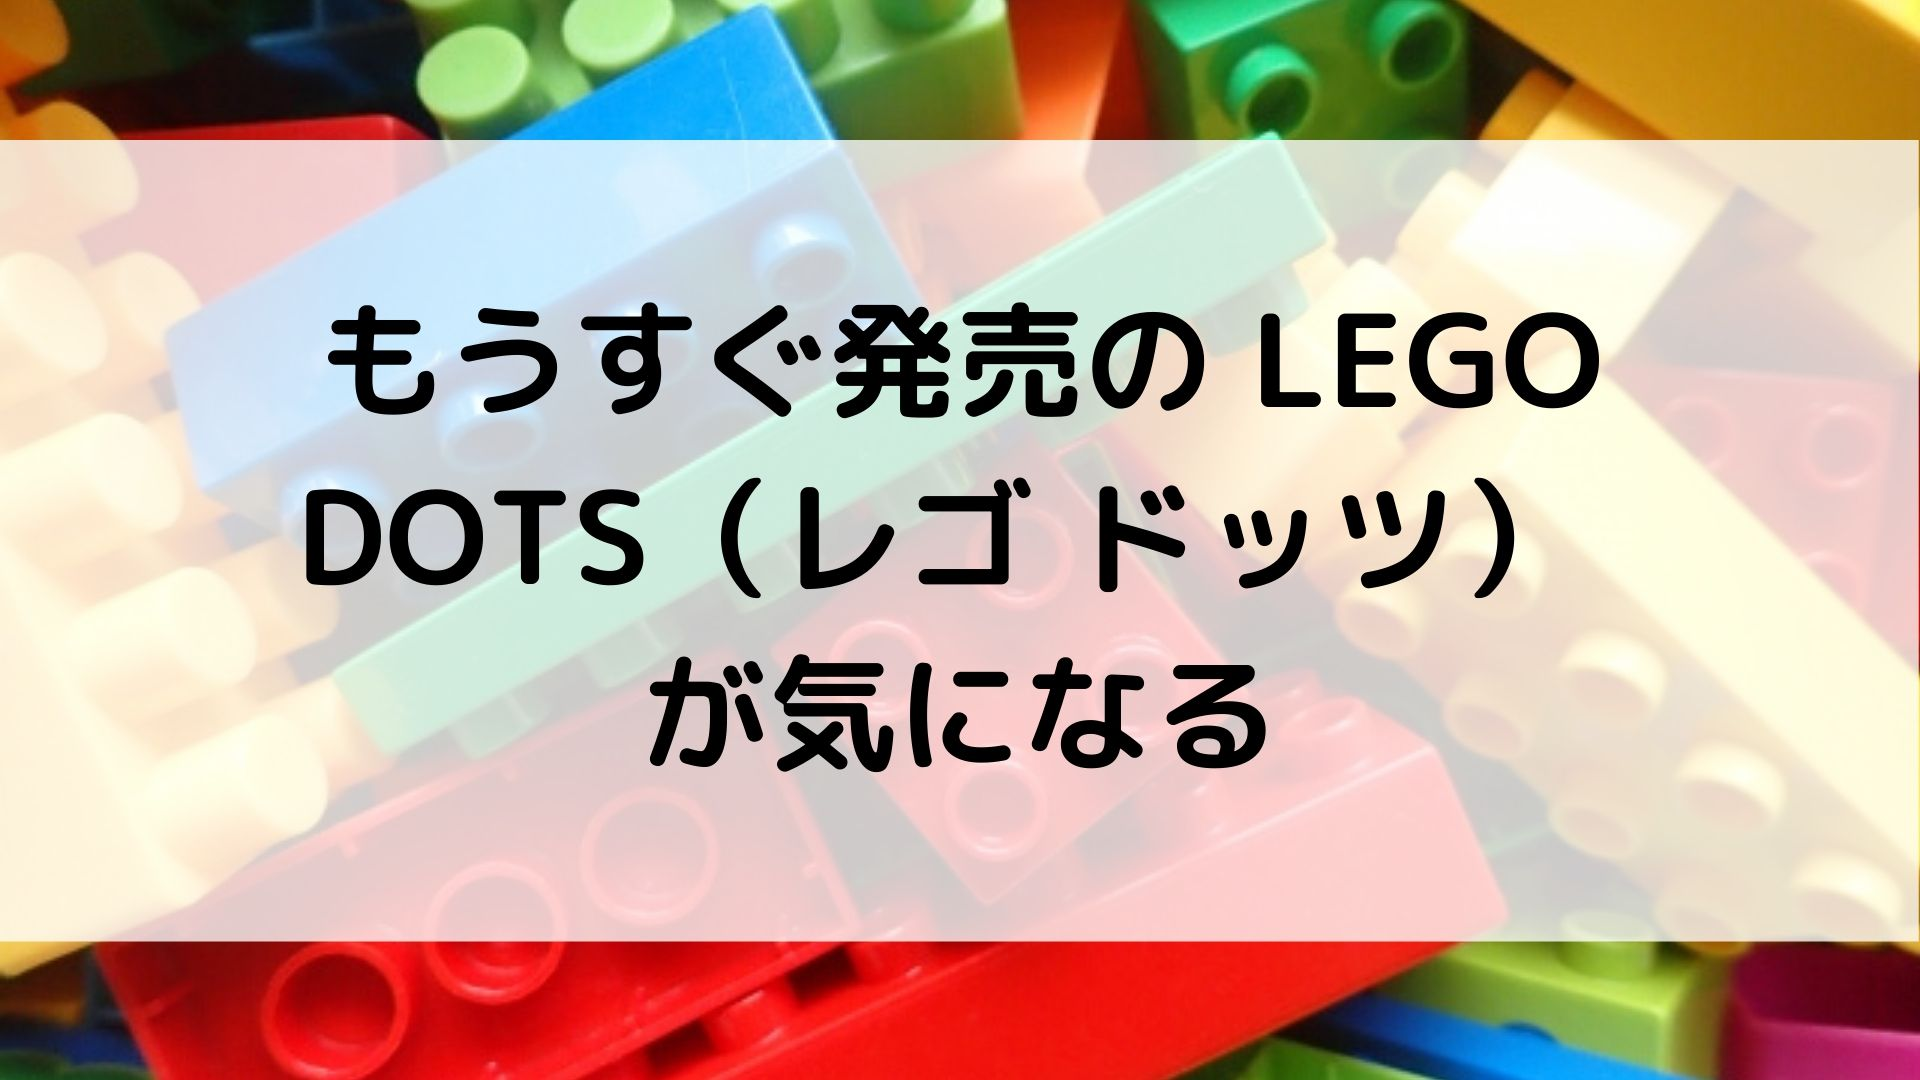 LEGO DOTS(レゴ ドッツ)